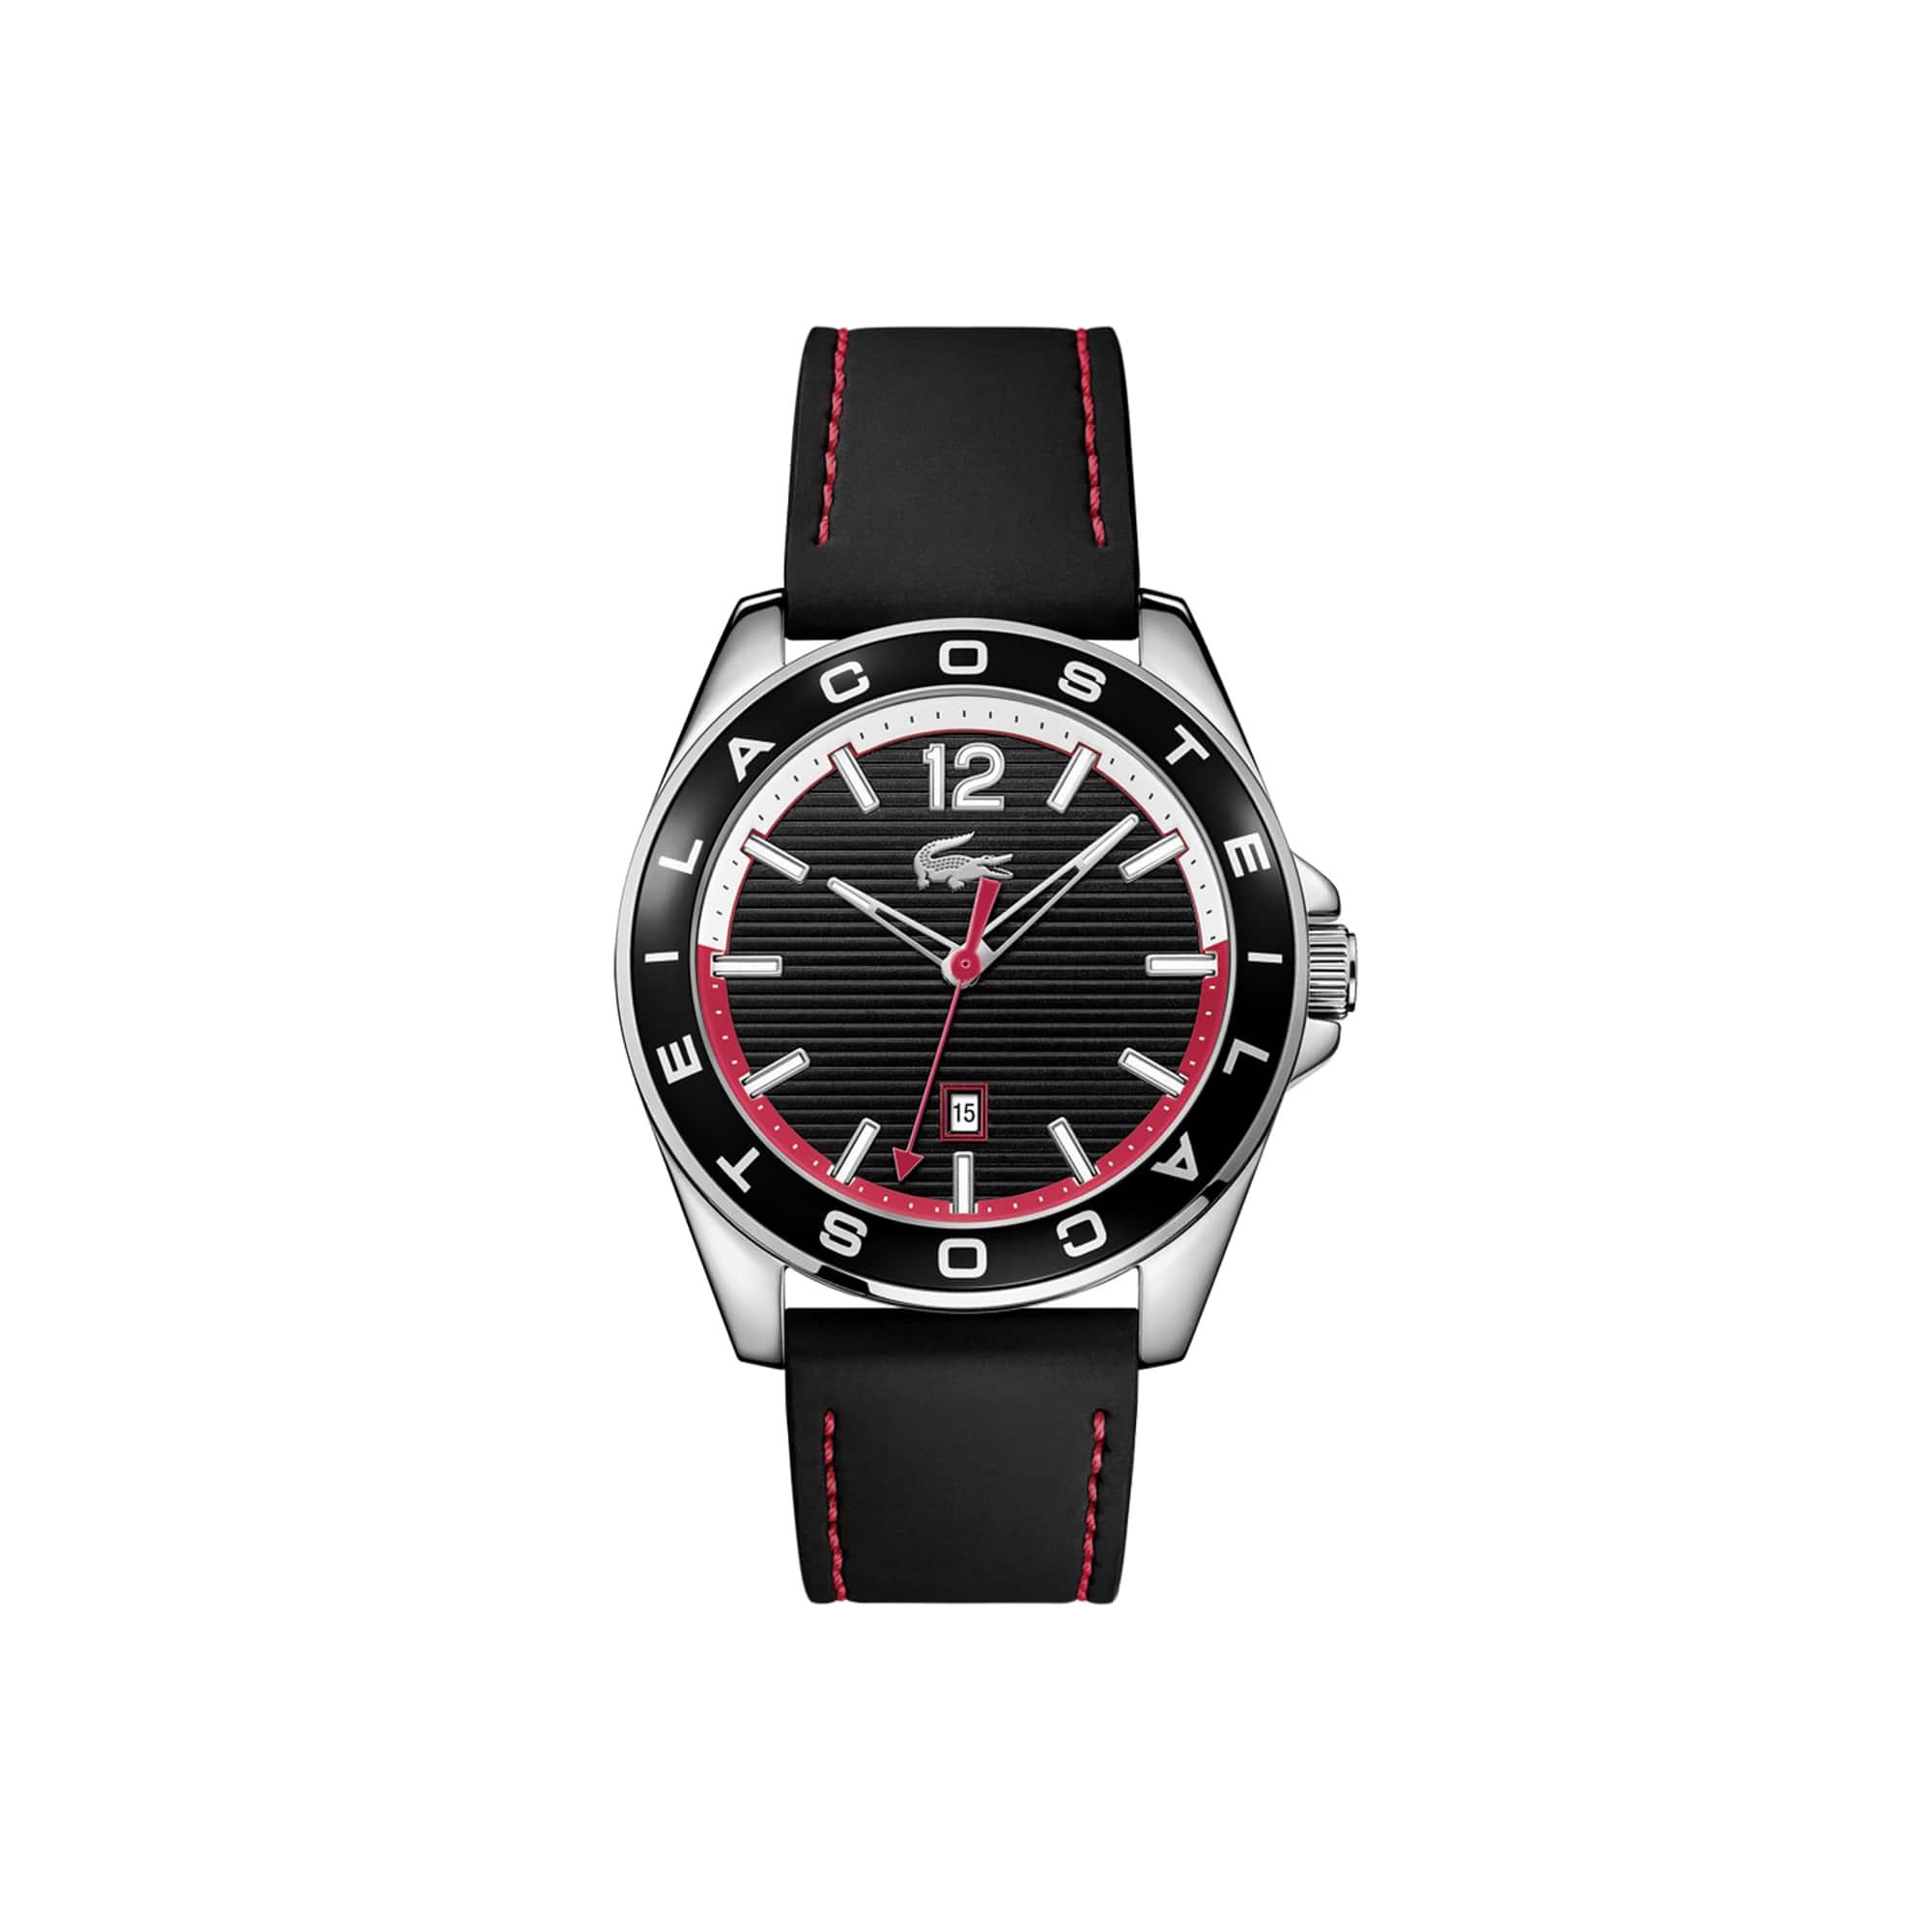 Men's Westport Watch with Black Leather Strap